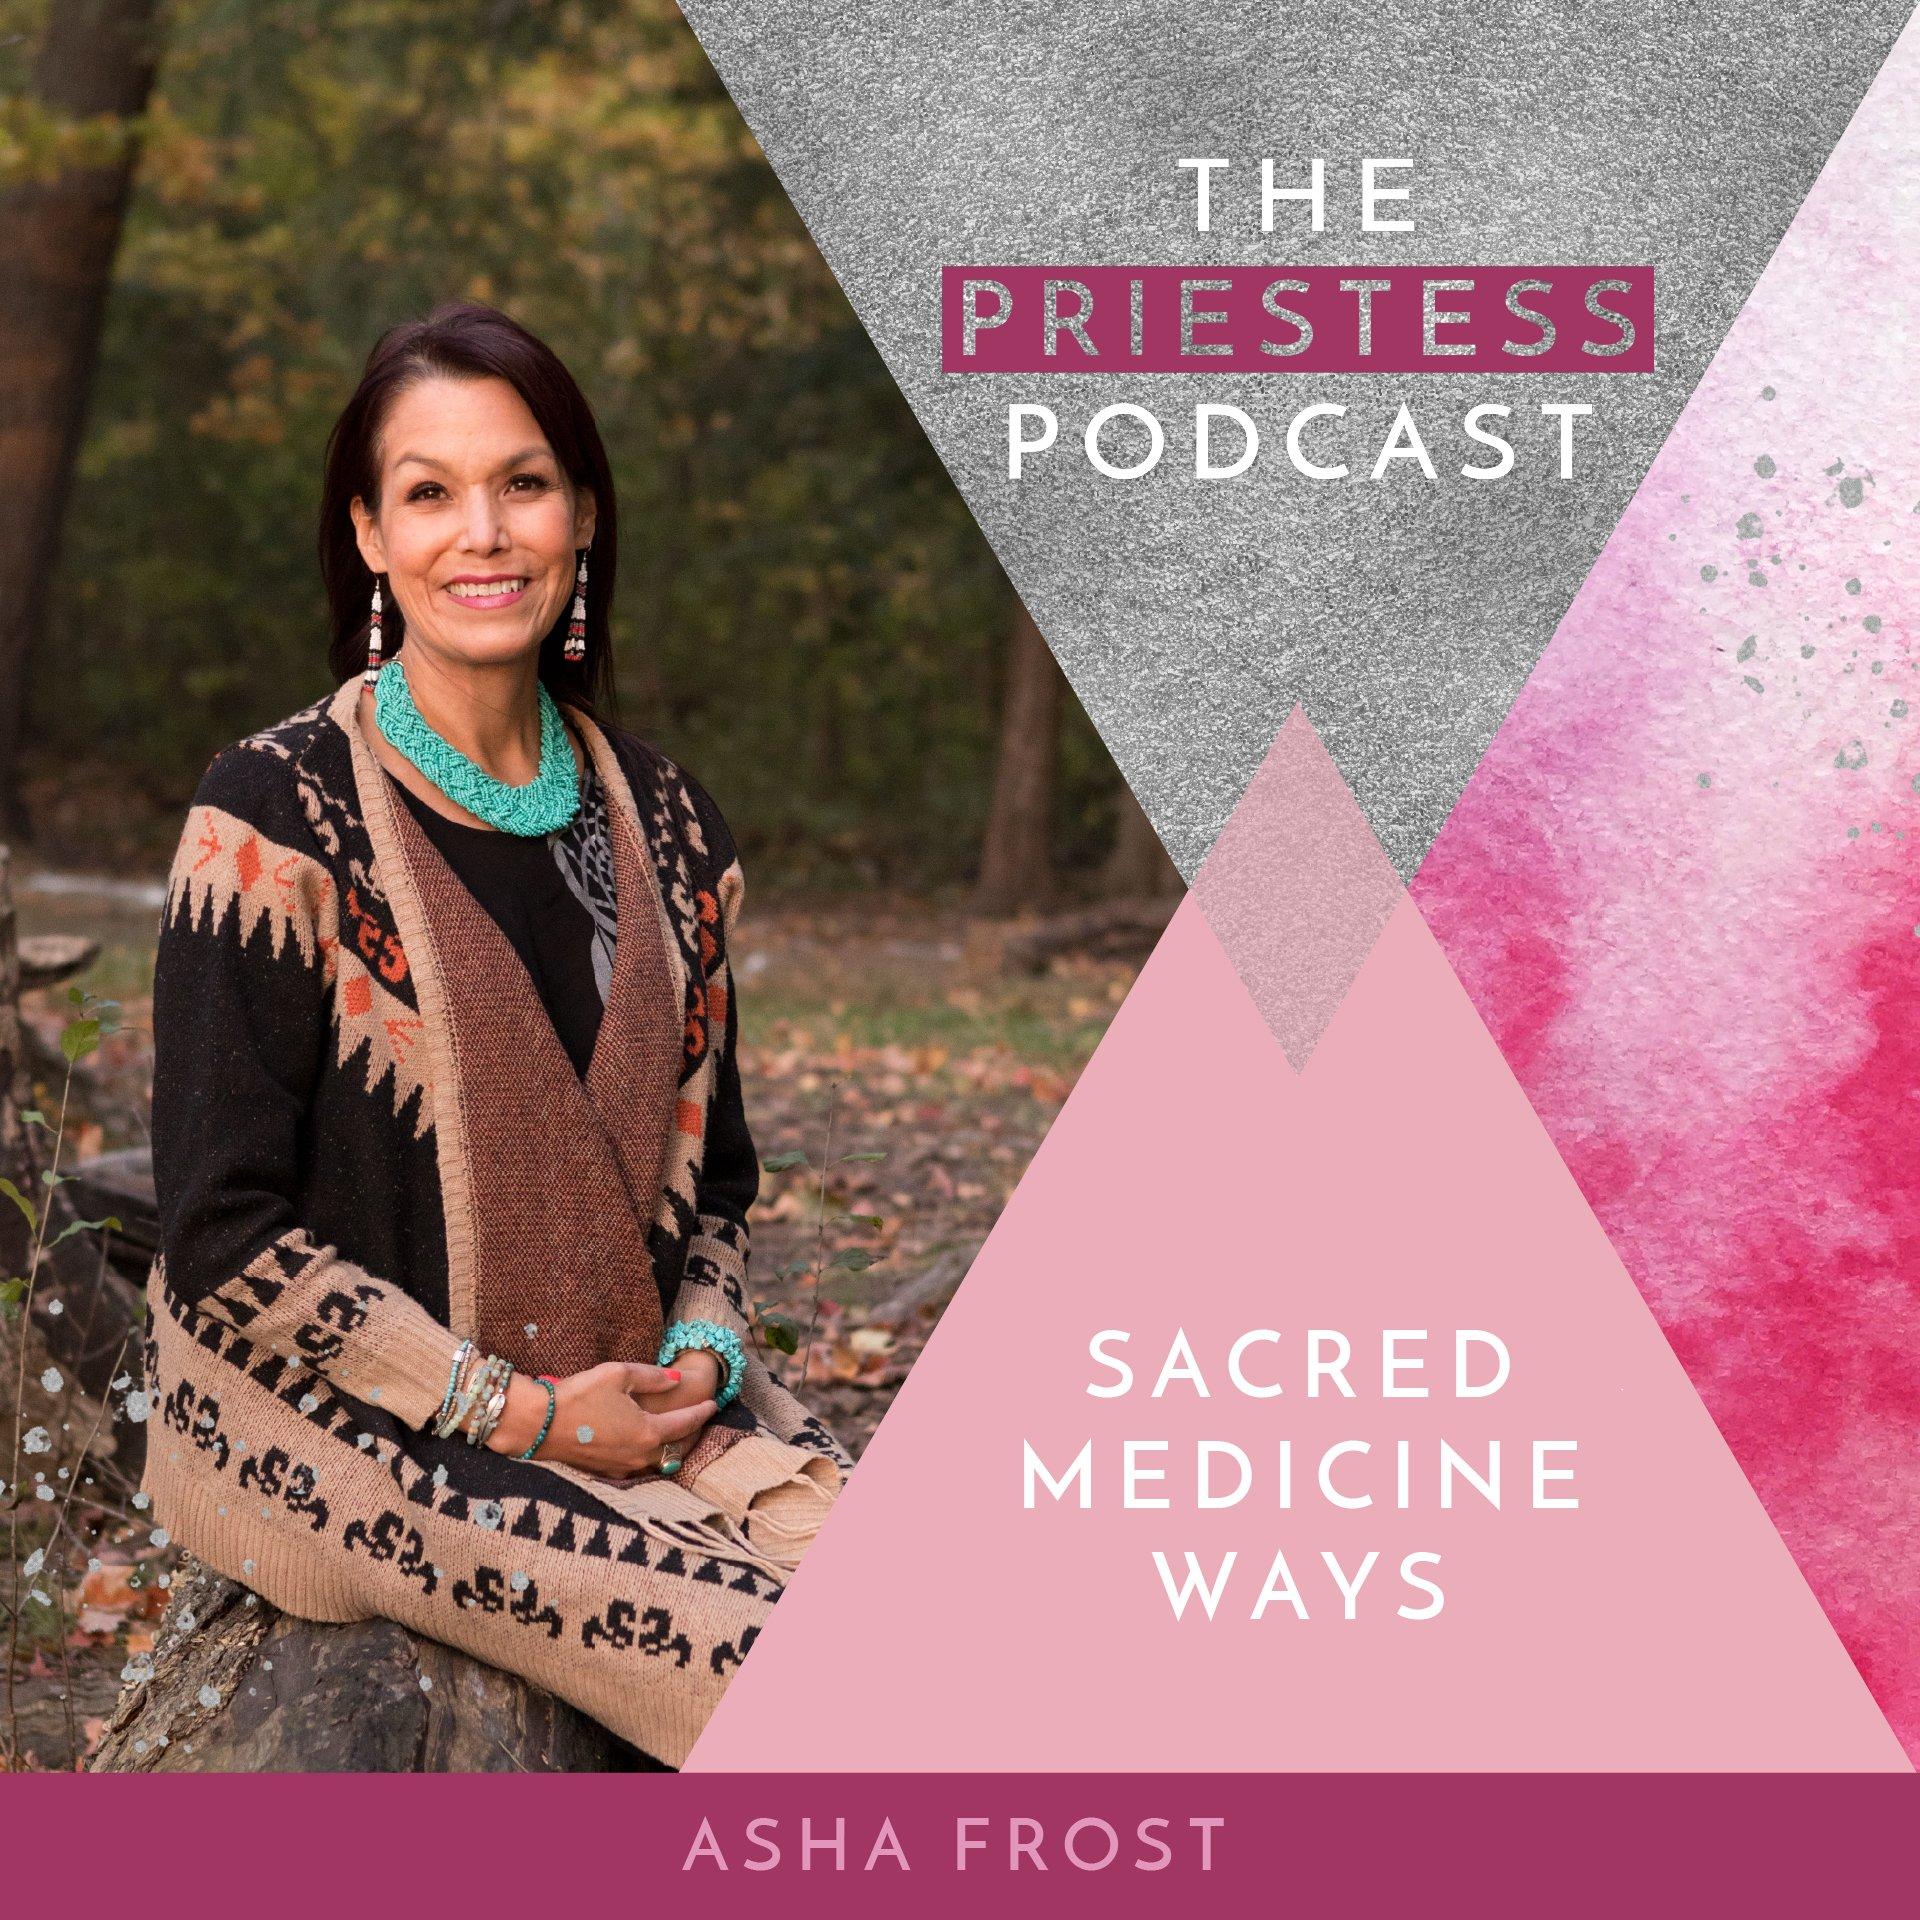 Asha Frost on Sacred Medicine Ways